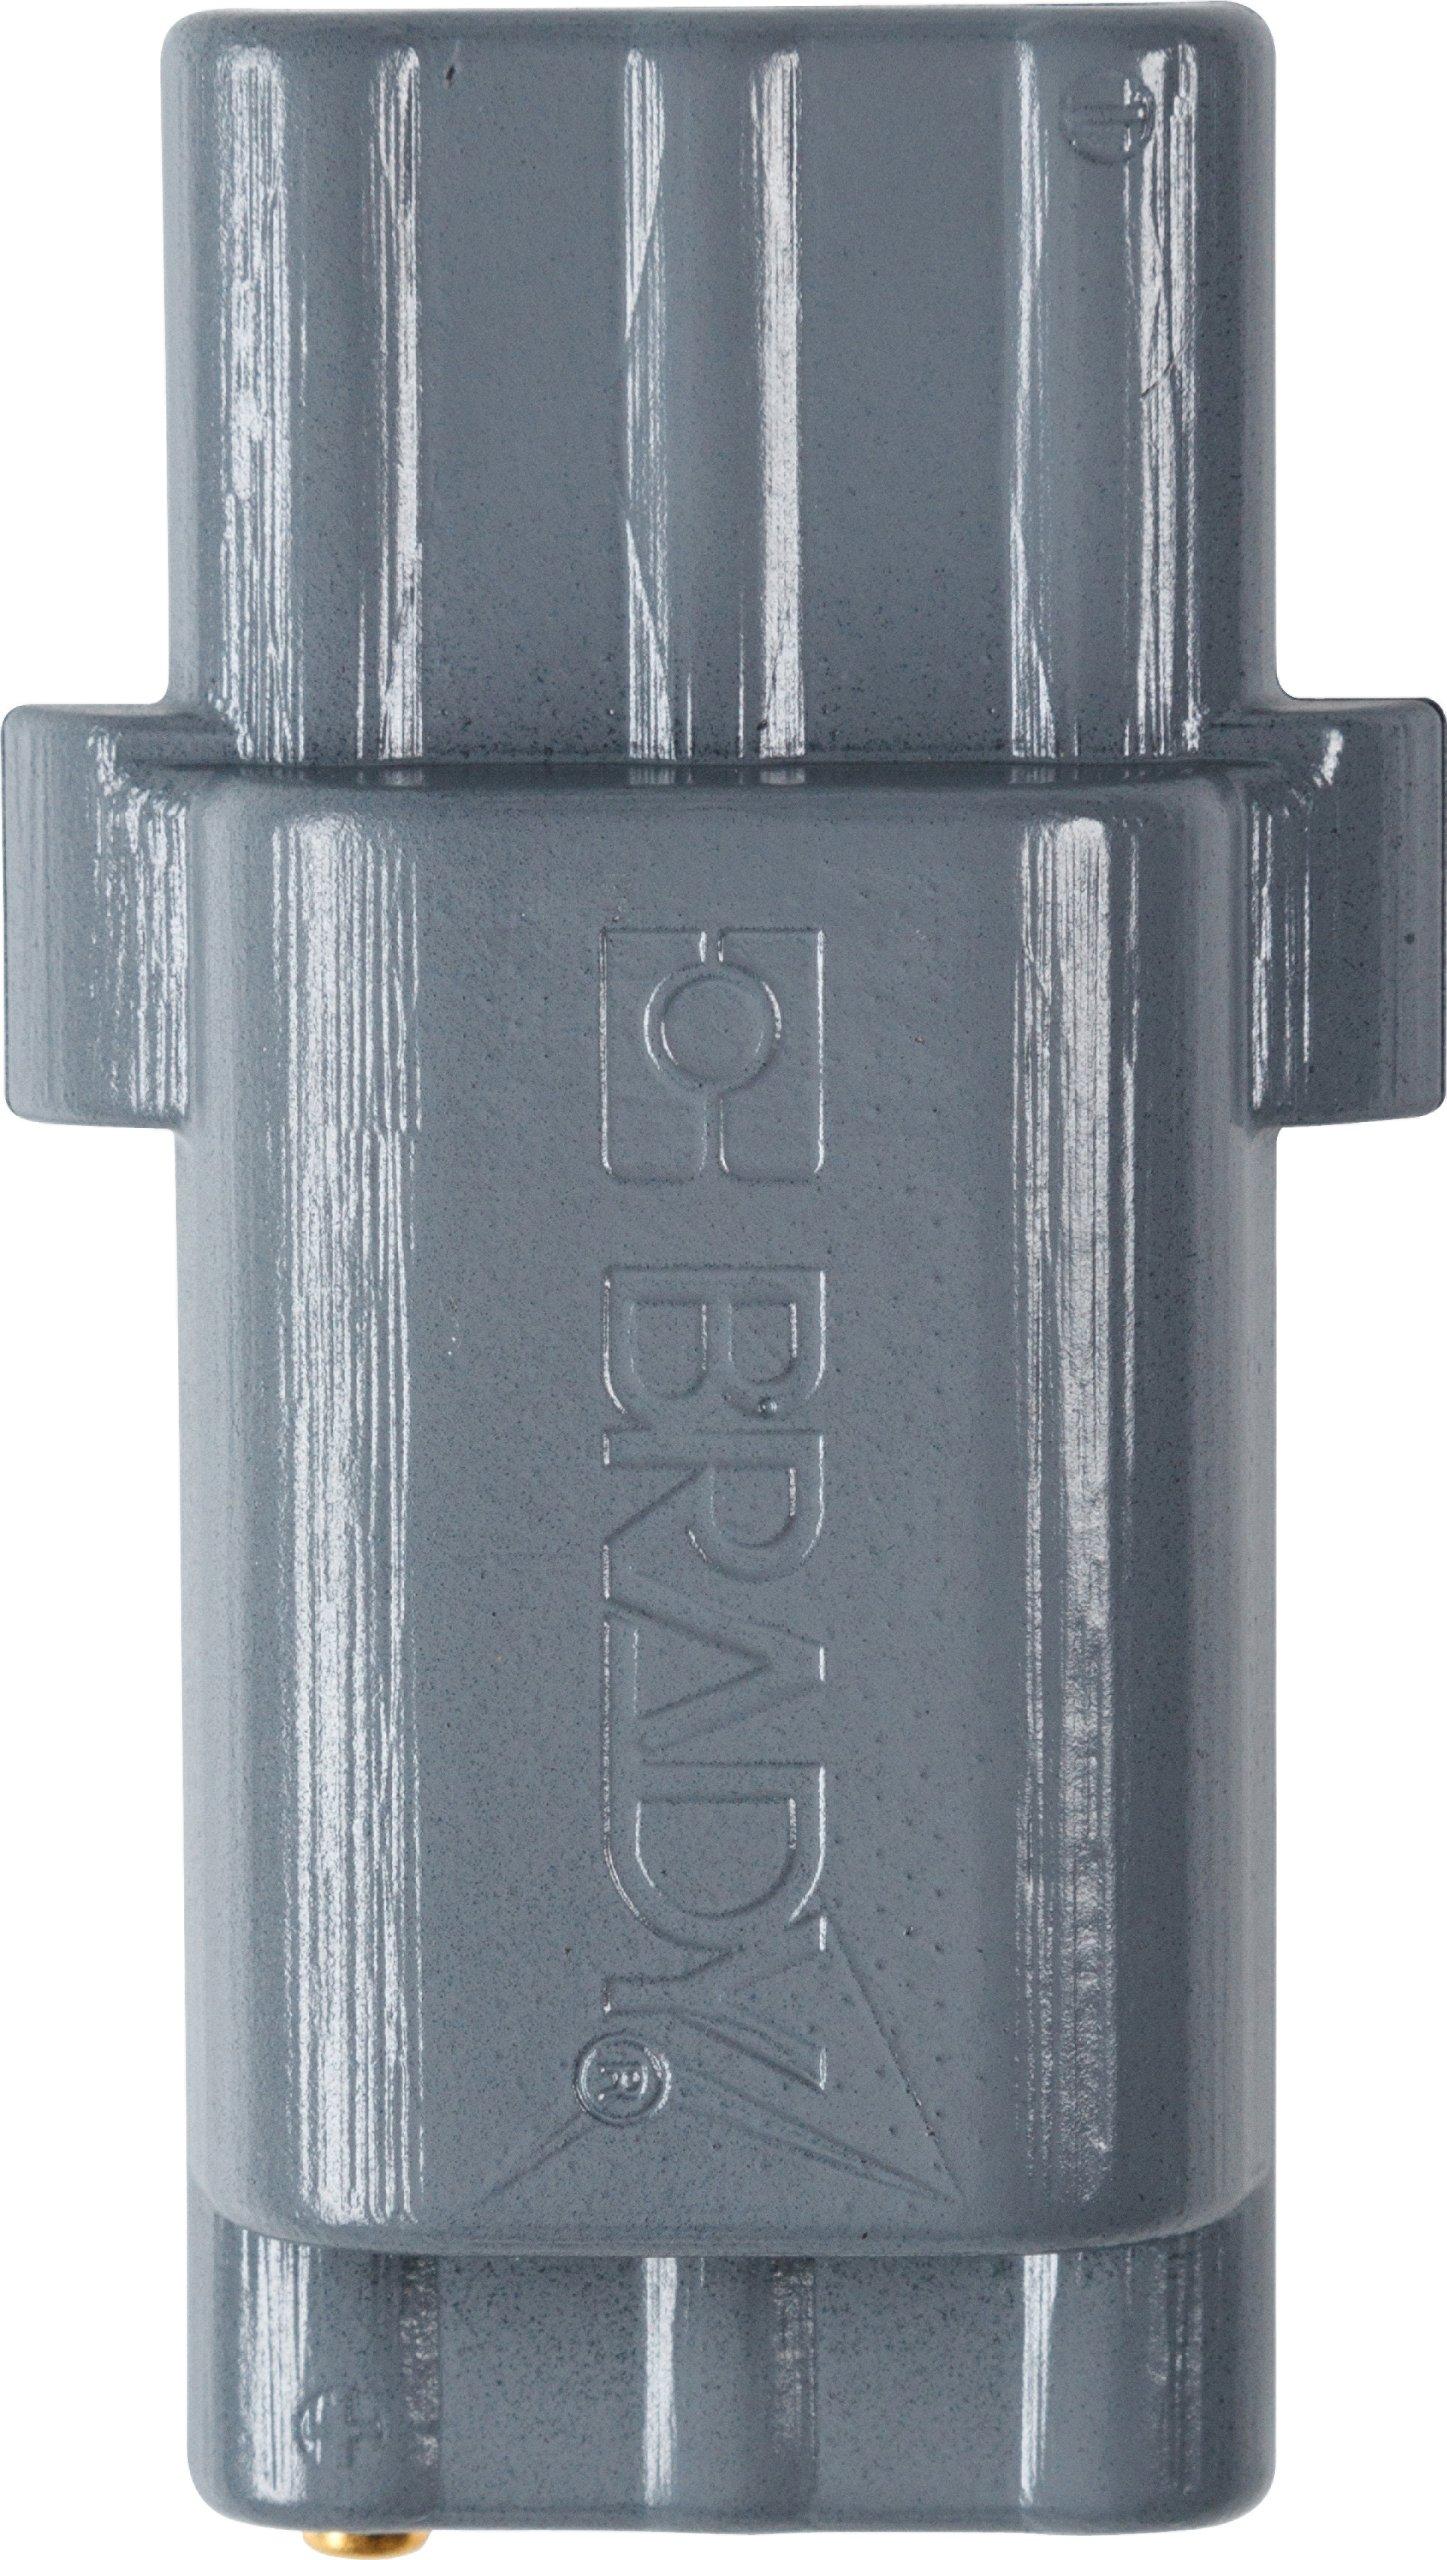 Brady BMP21-PLUS-BATT Rechargeable Lithium Ion Battery by Brady